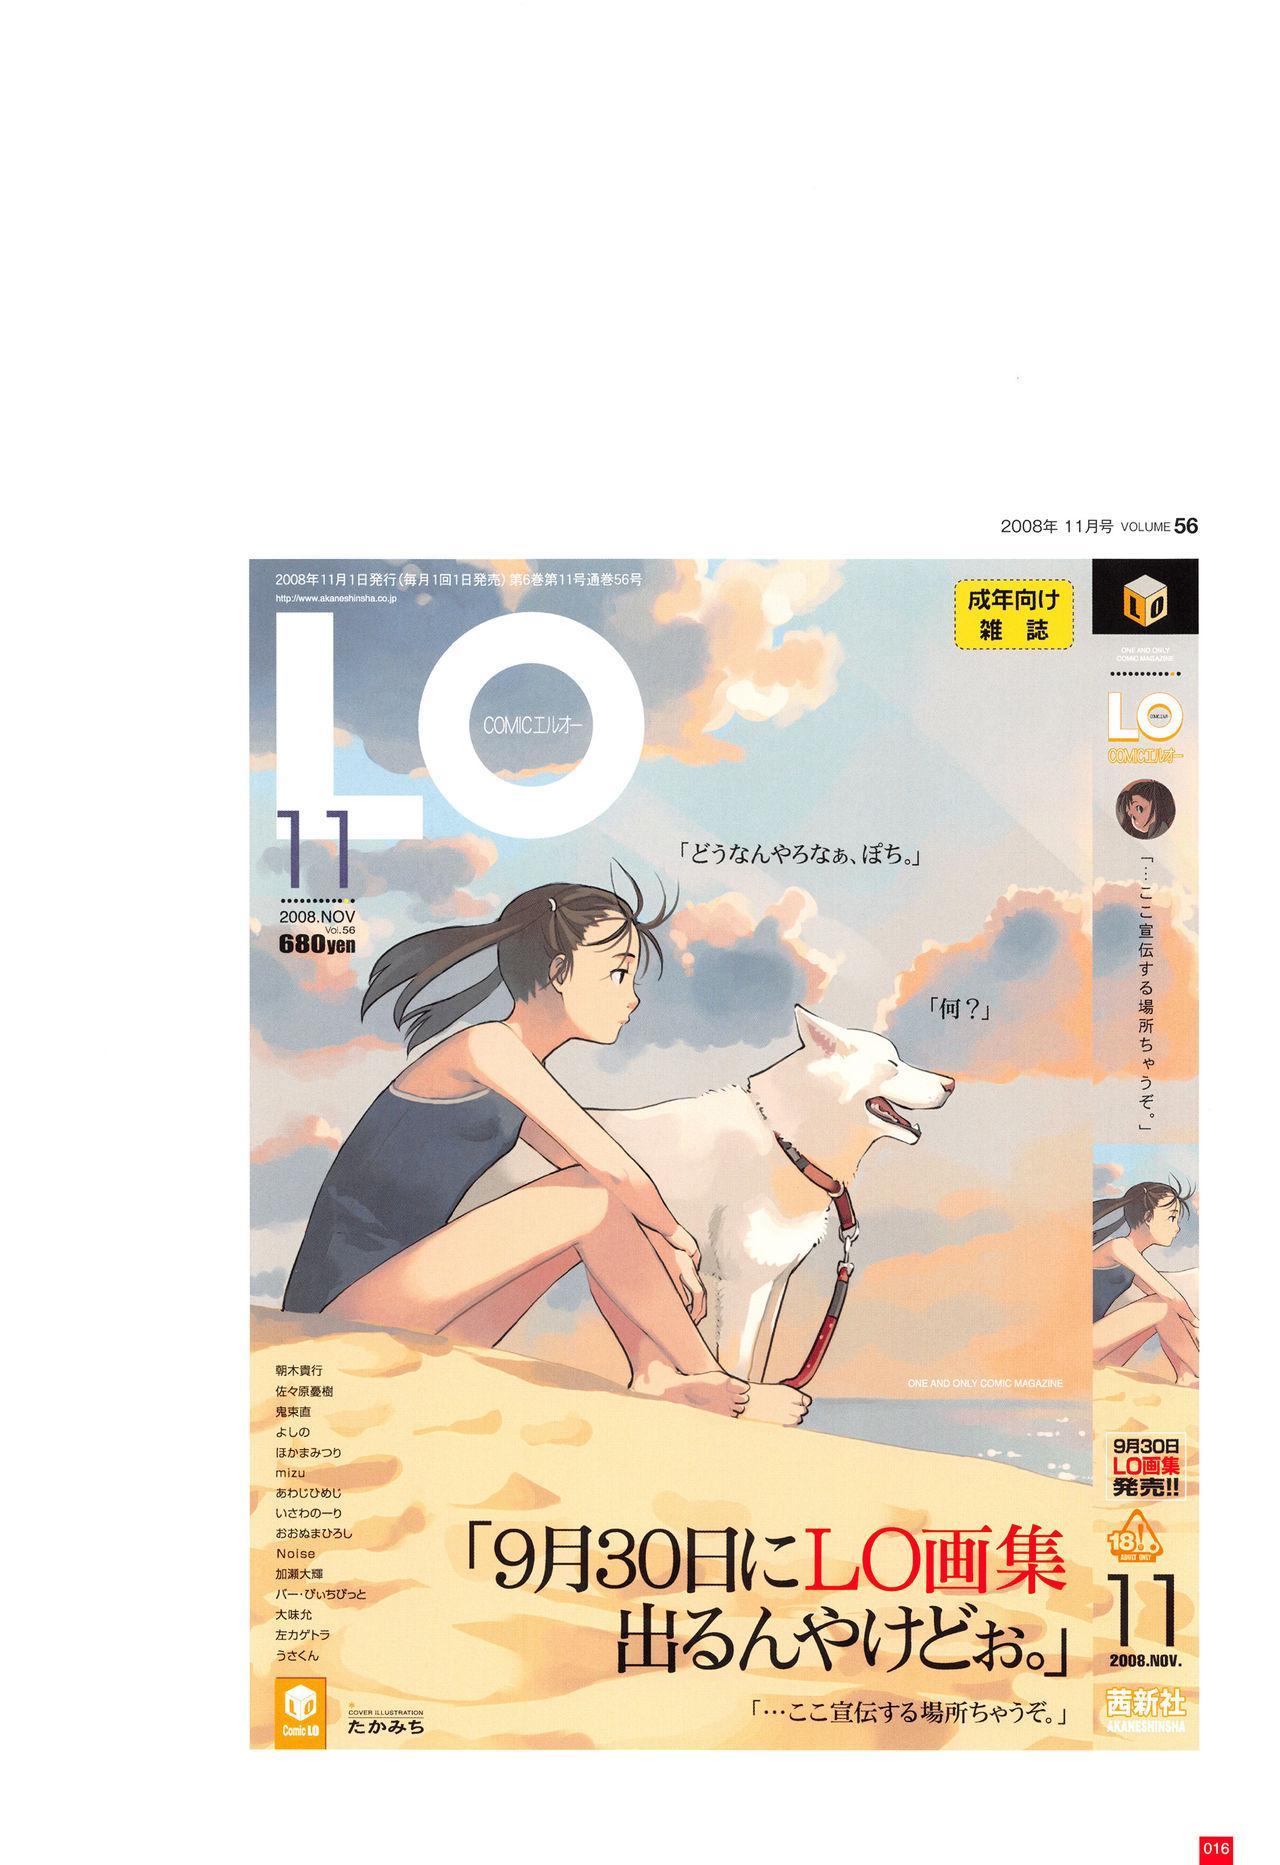 LO Artbook 2-A TAKAMICHI LOOP WORKS 18